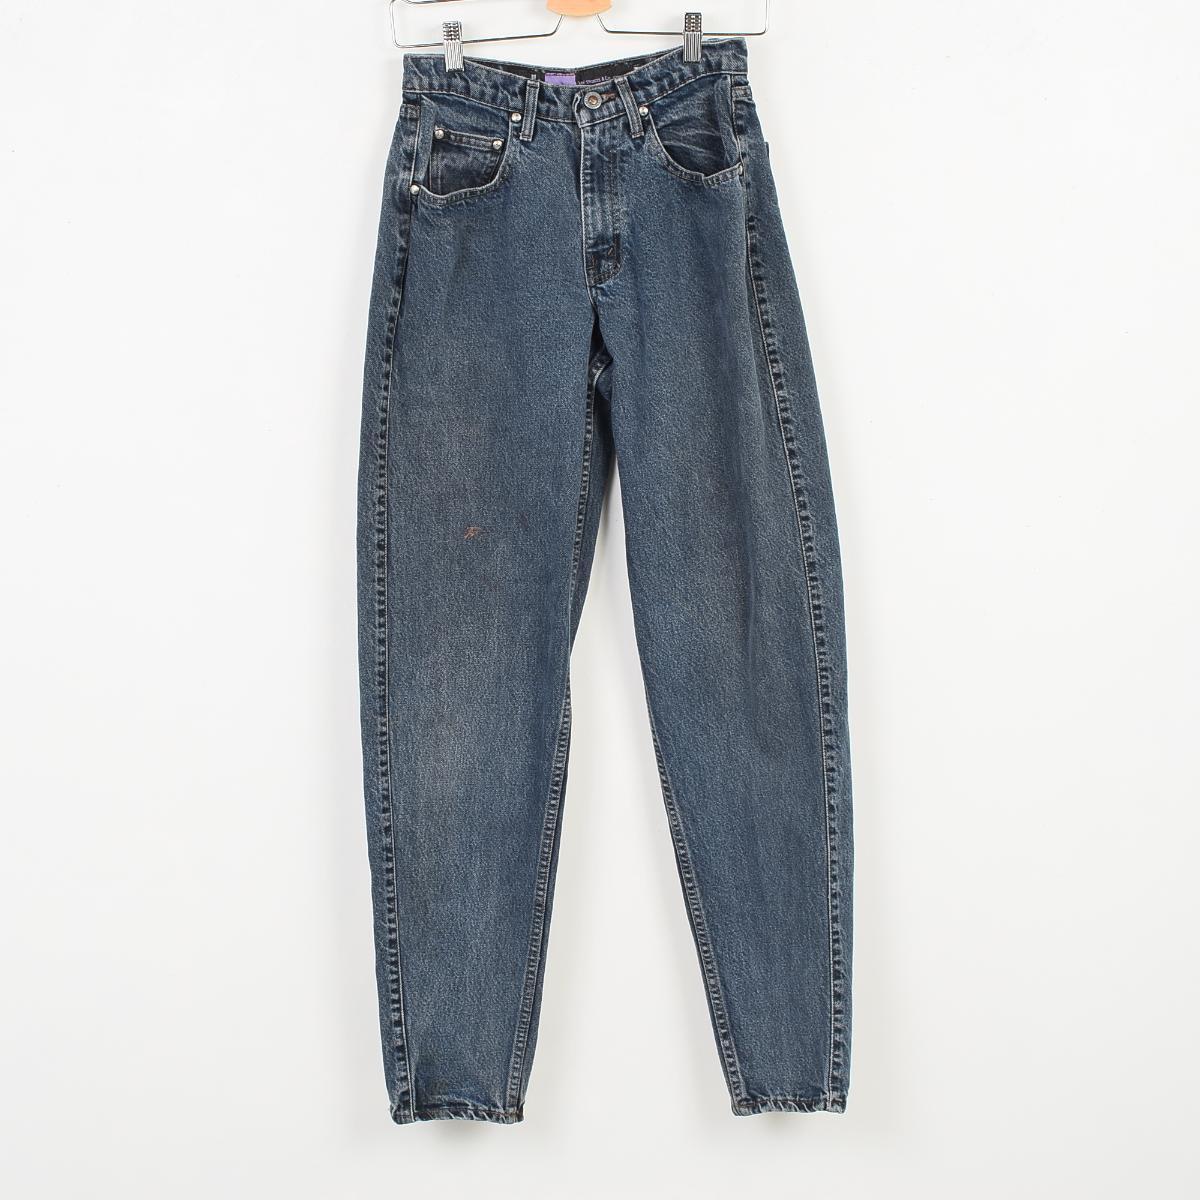 VINTAGE CLOTHING JAM | Rakuten Global Market: 90's Levi's SILVER ...